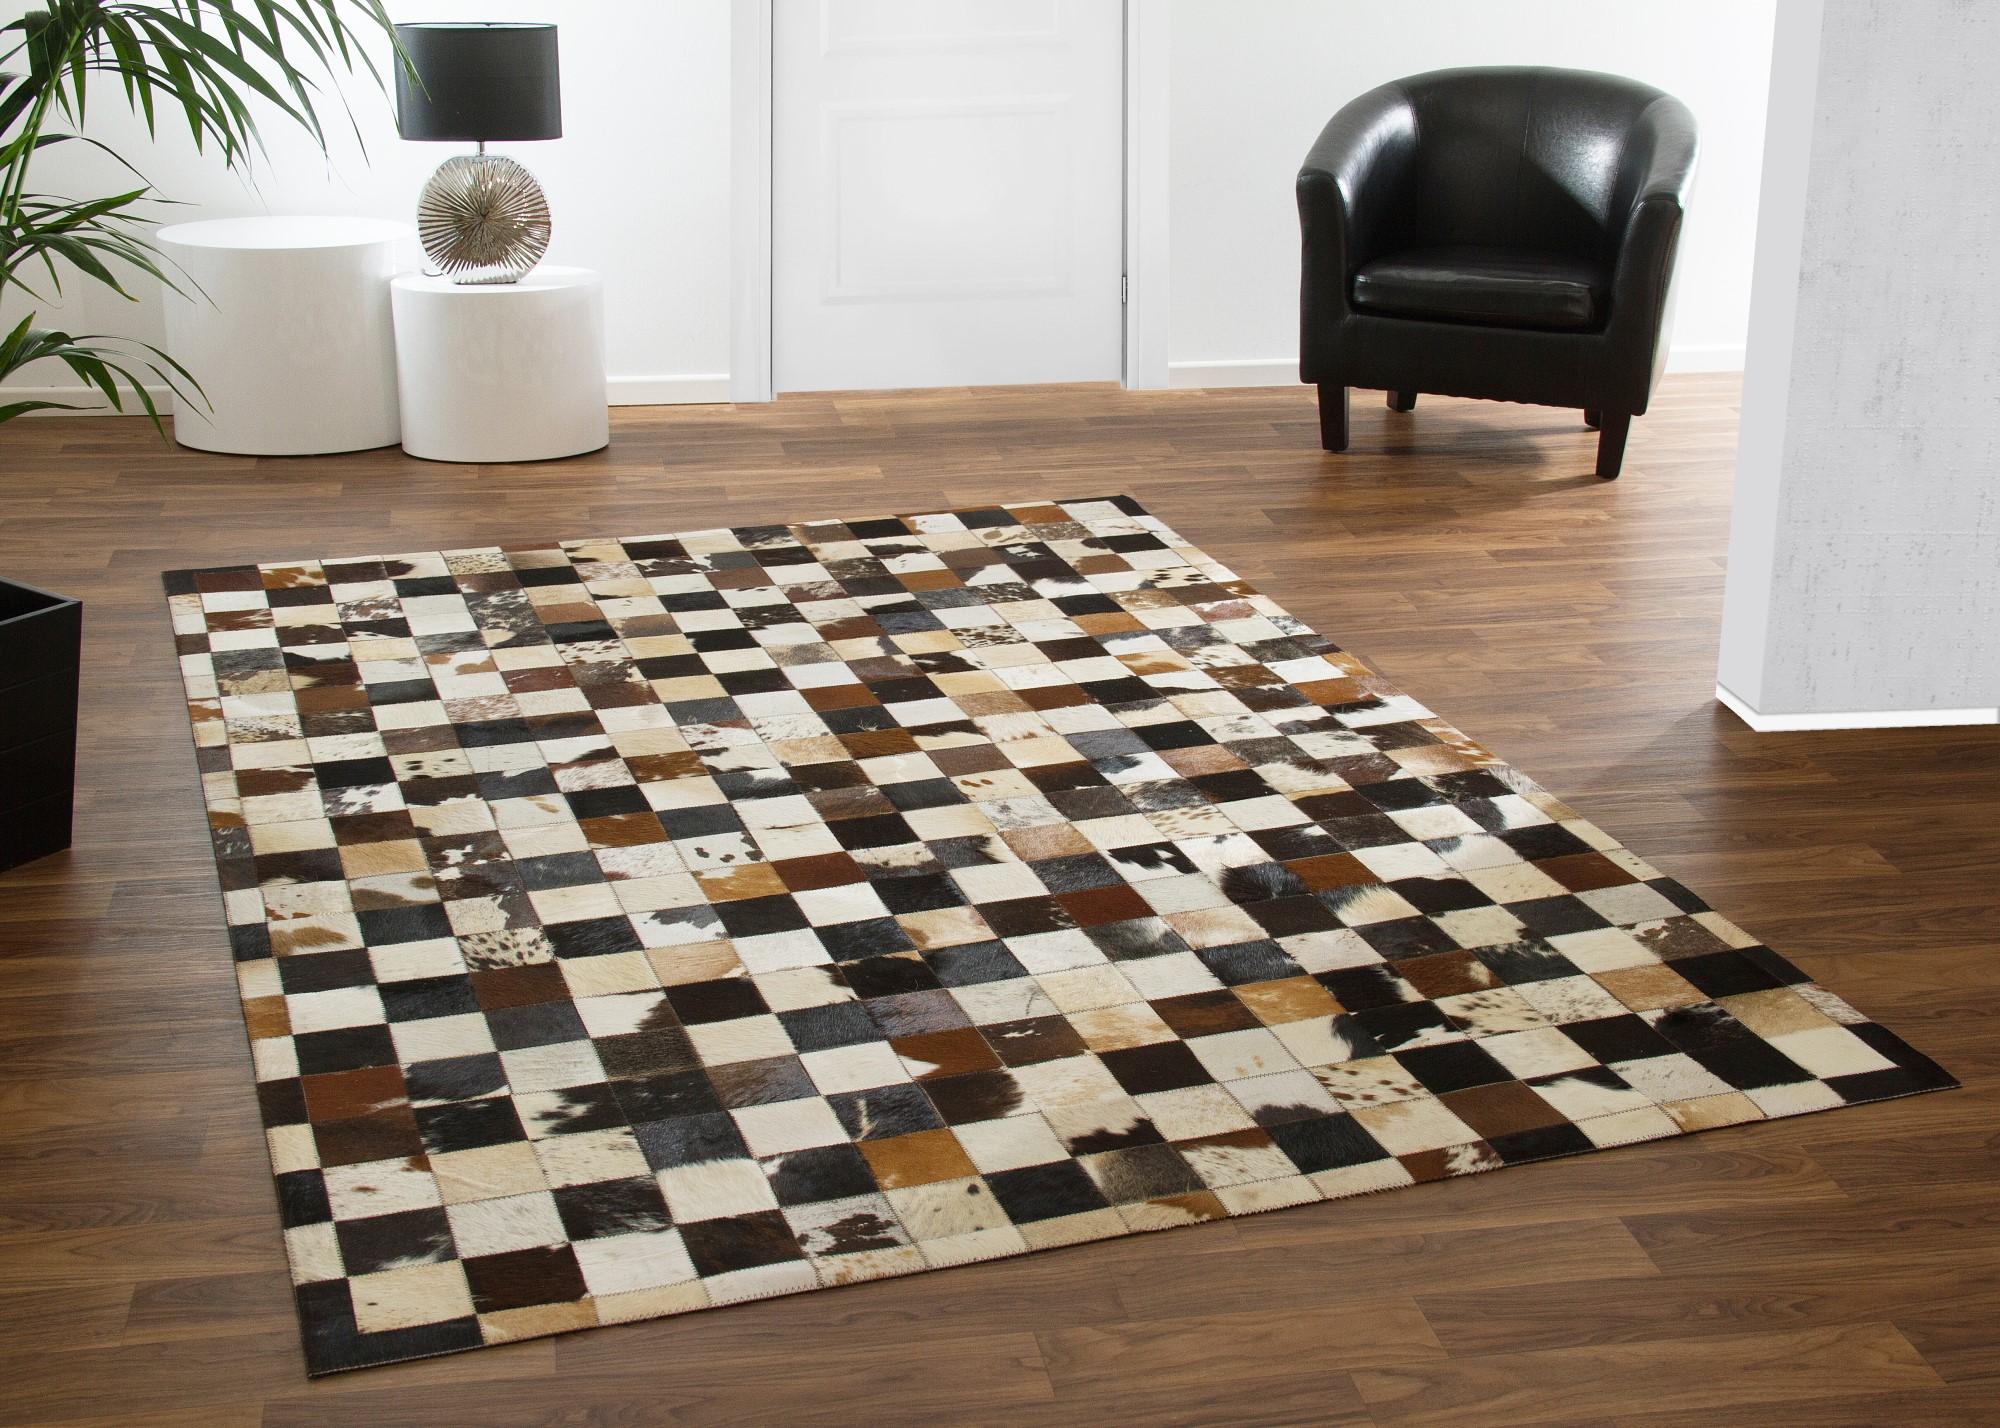 designer teppich modern buffalo kuhfell streifen karo natur patch ebay. Black Bedroom Furniture Sets. Home Design Ideas